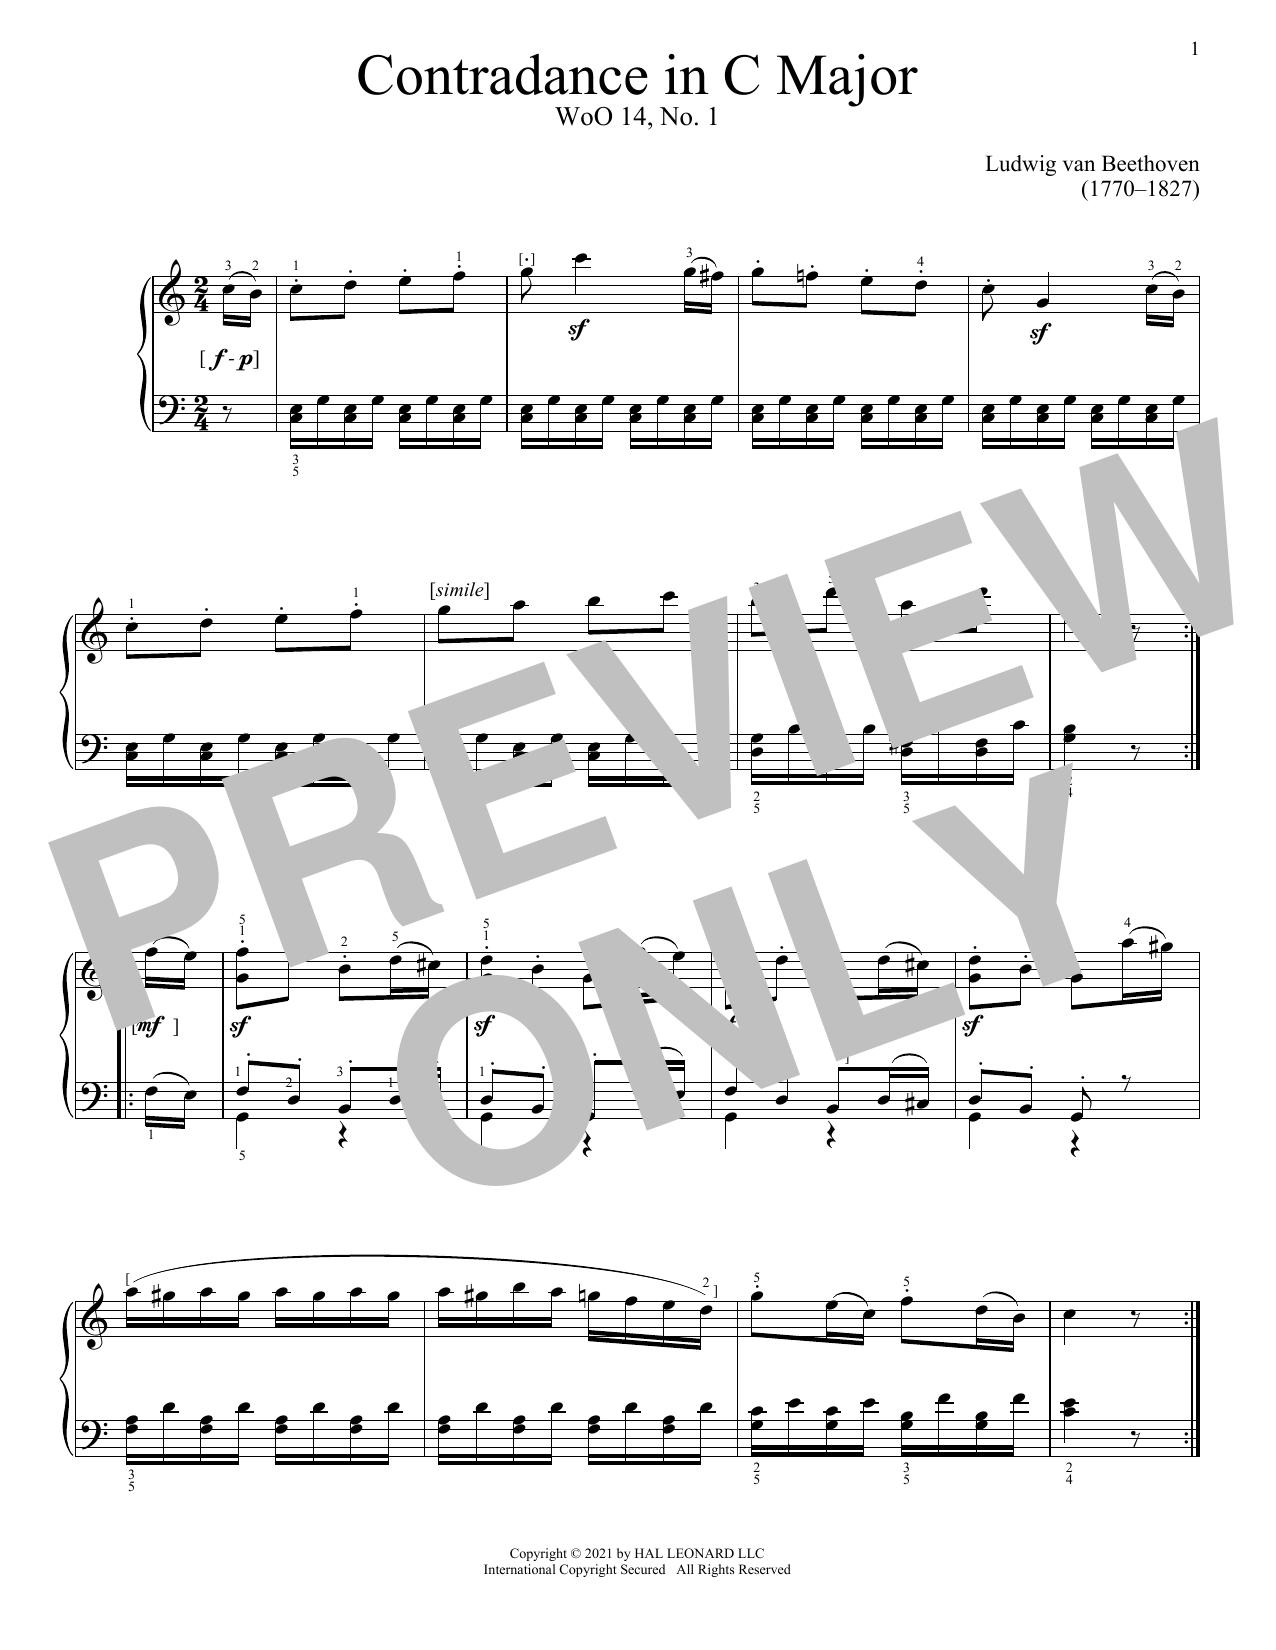 Ludwig van Beethoven Contredance In C Major, WoO 14, No. 1 sheet music notes printable PDF score